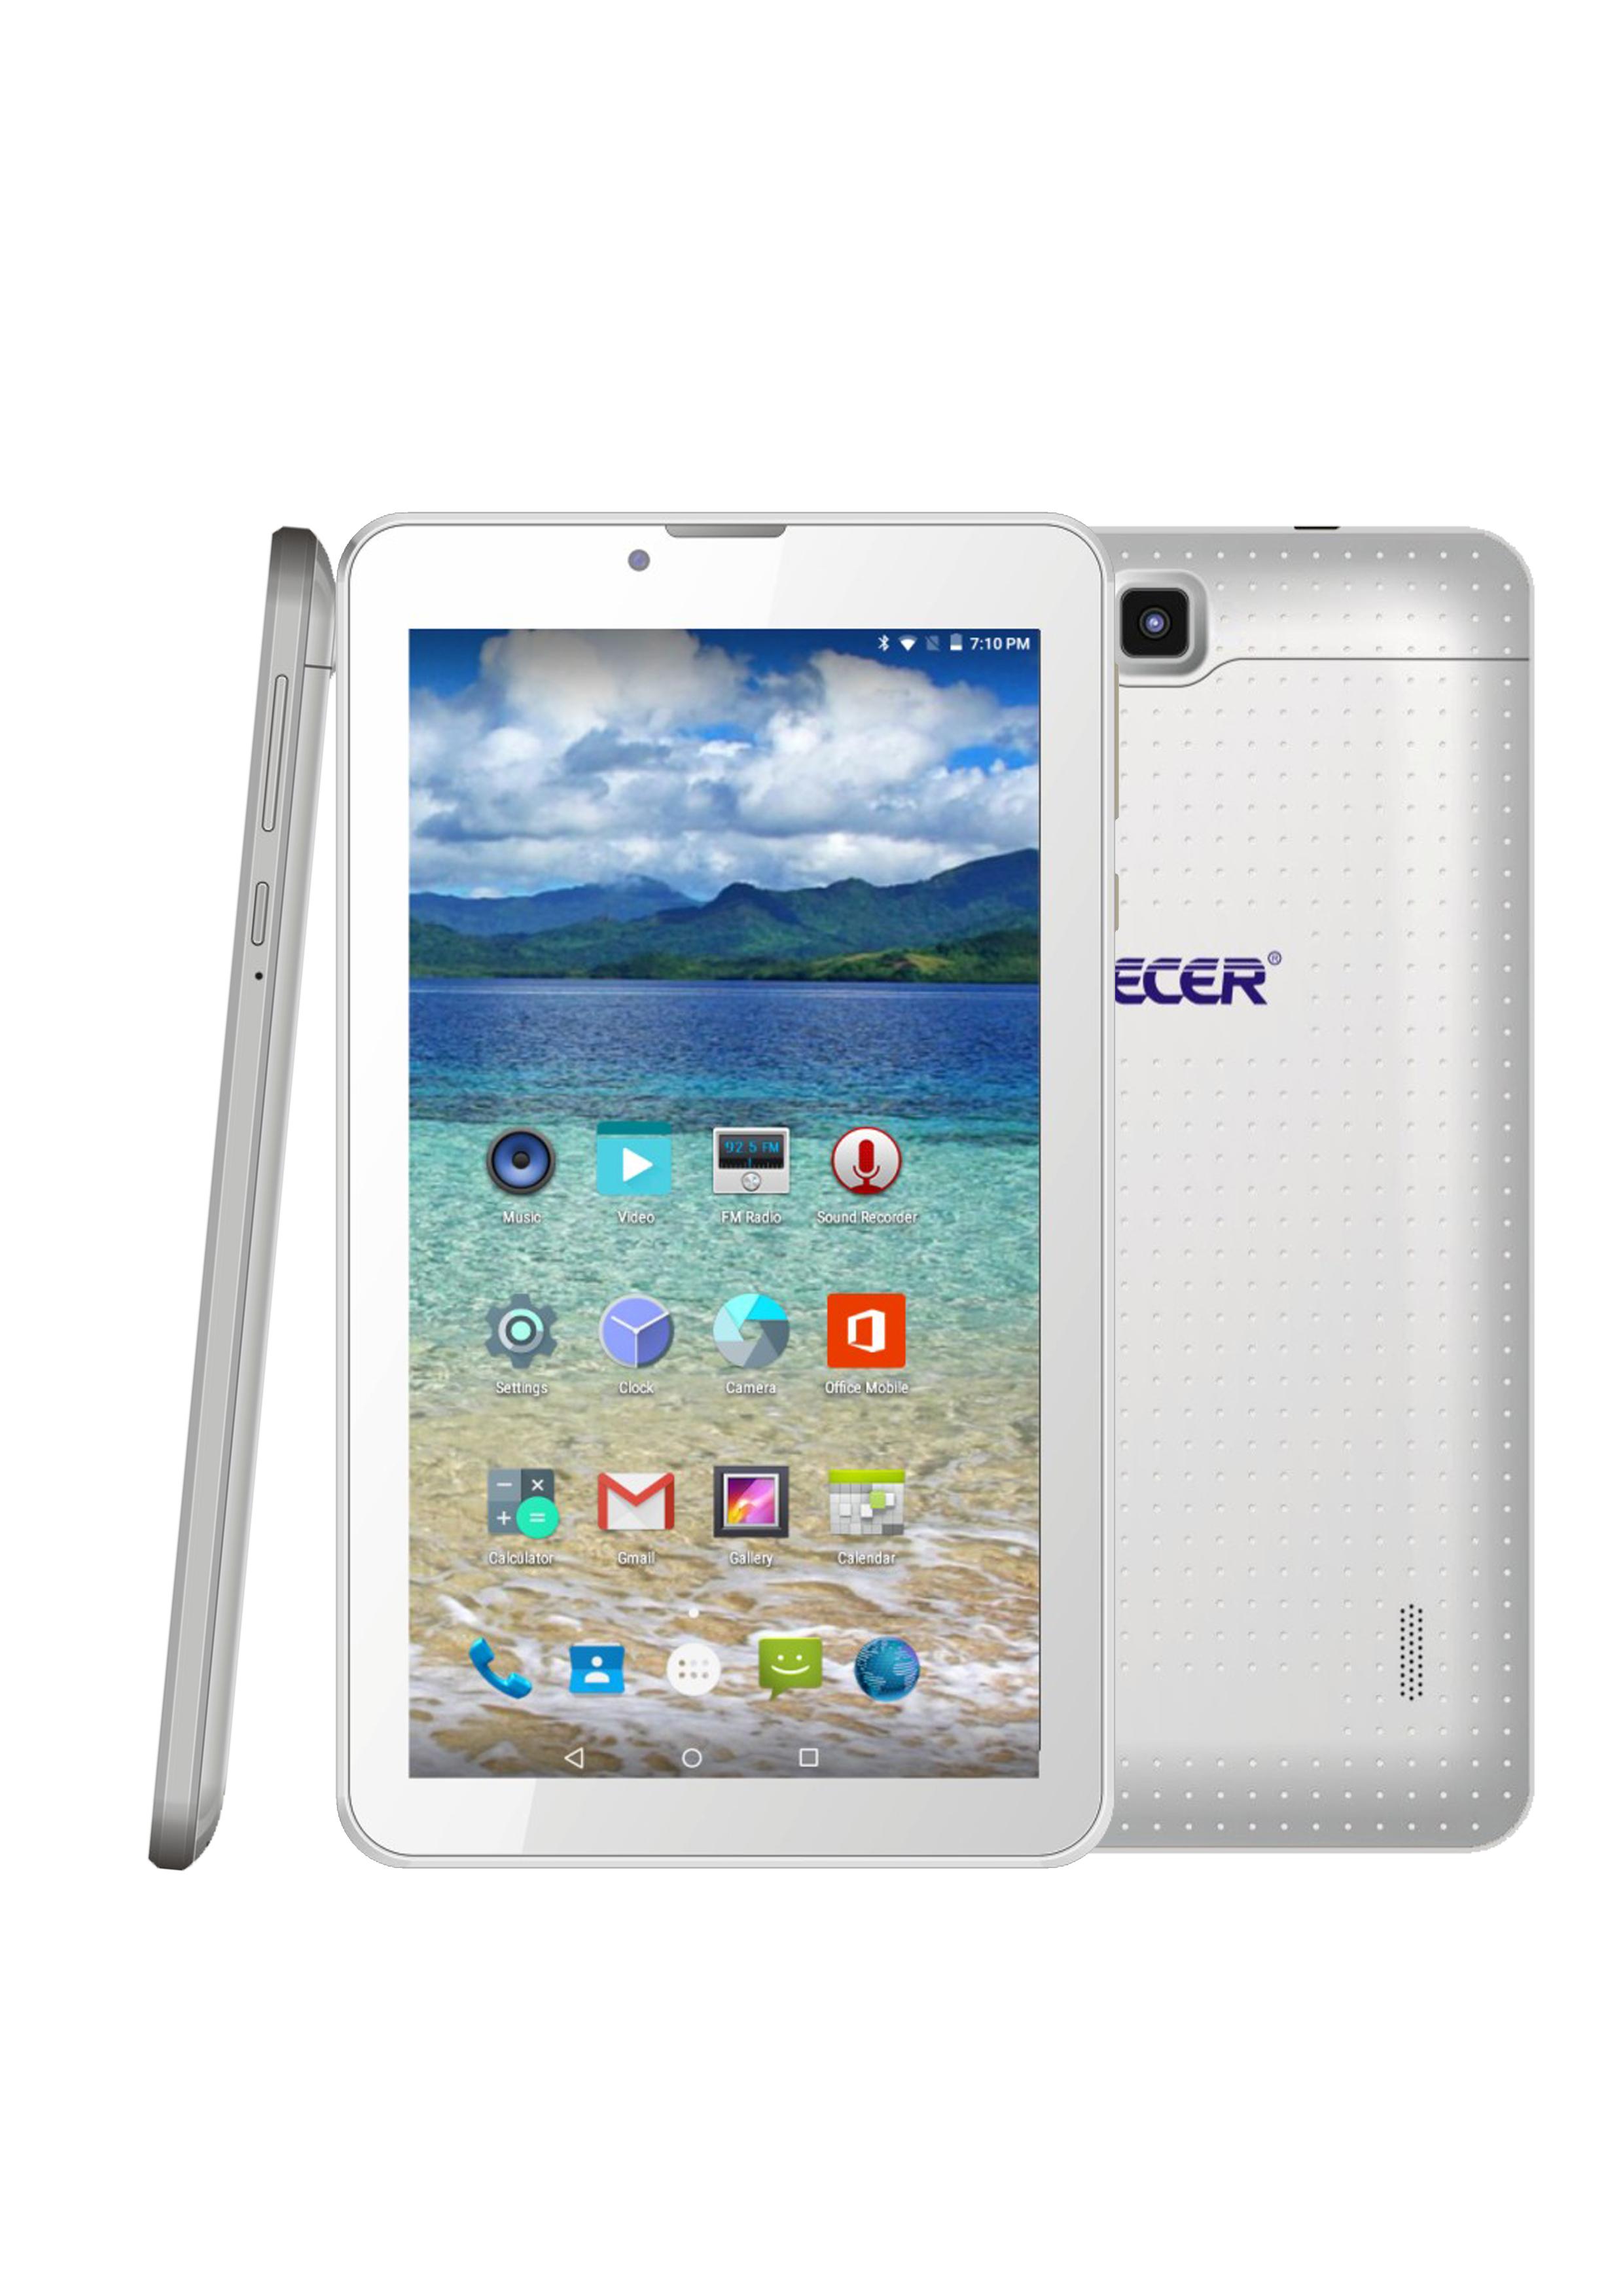 Mecer Xpress Smartlife – A720 Android Phablet